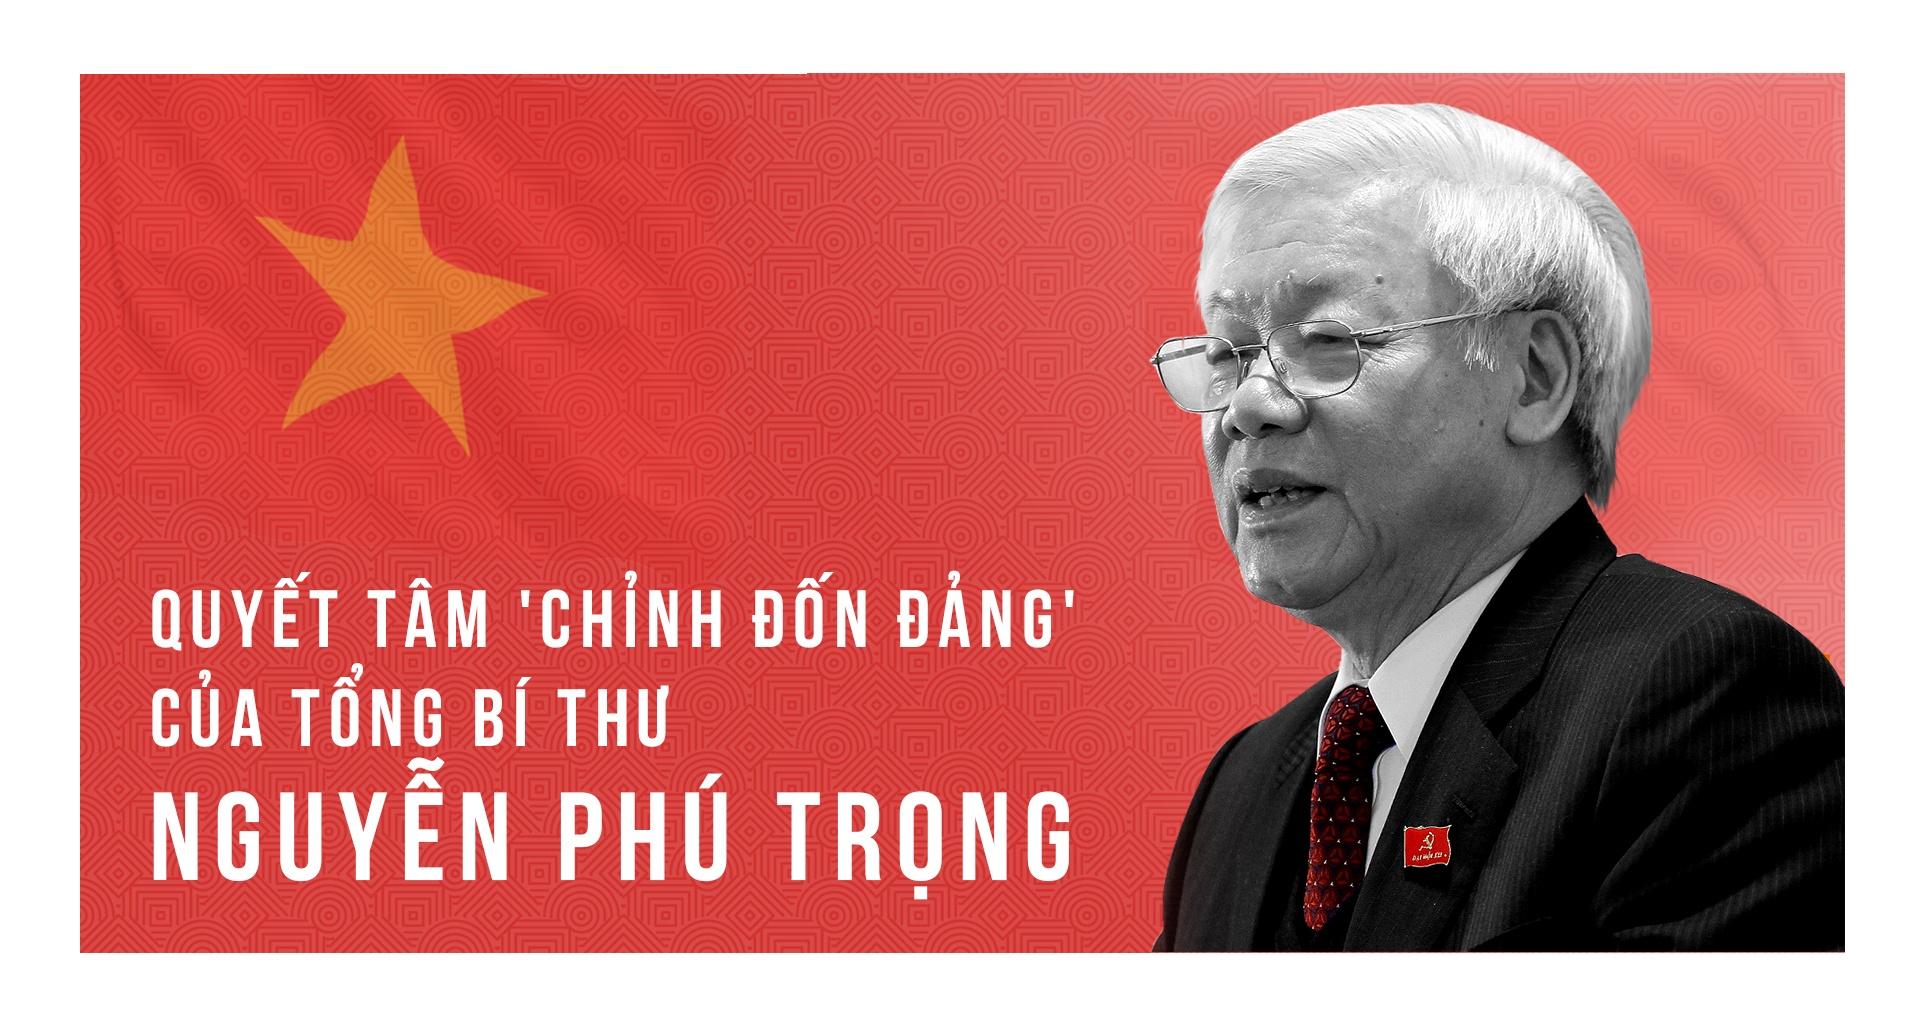 Quyet tam 'chinh don Dang' cua Tong bi thu Nguyen Phu Trong hinh anh 2